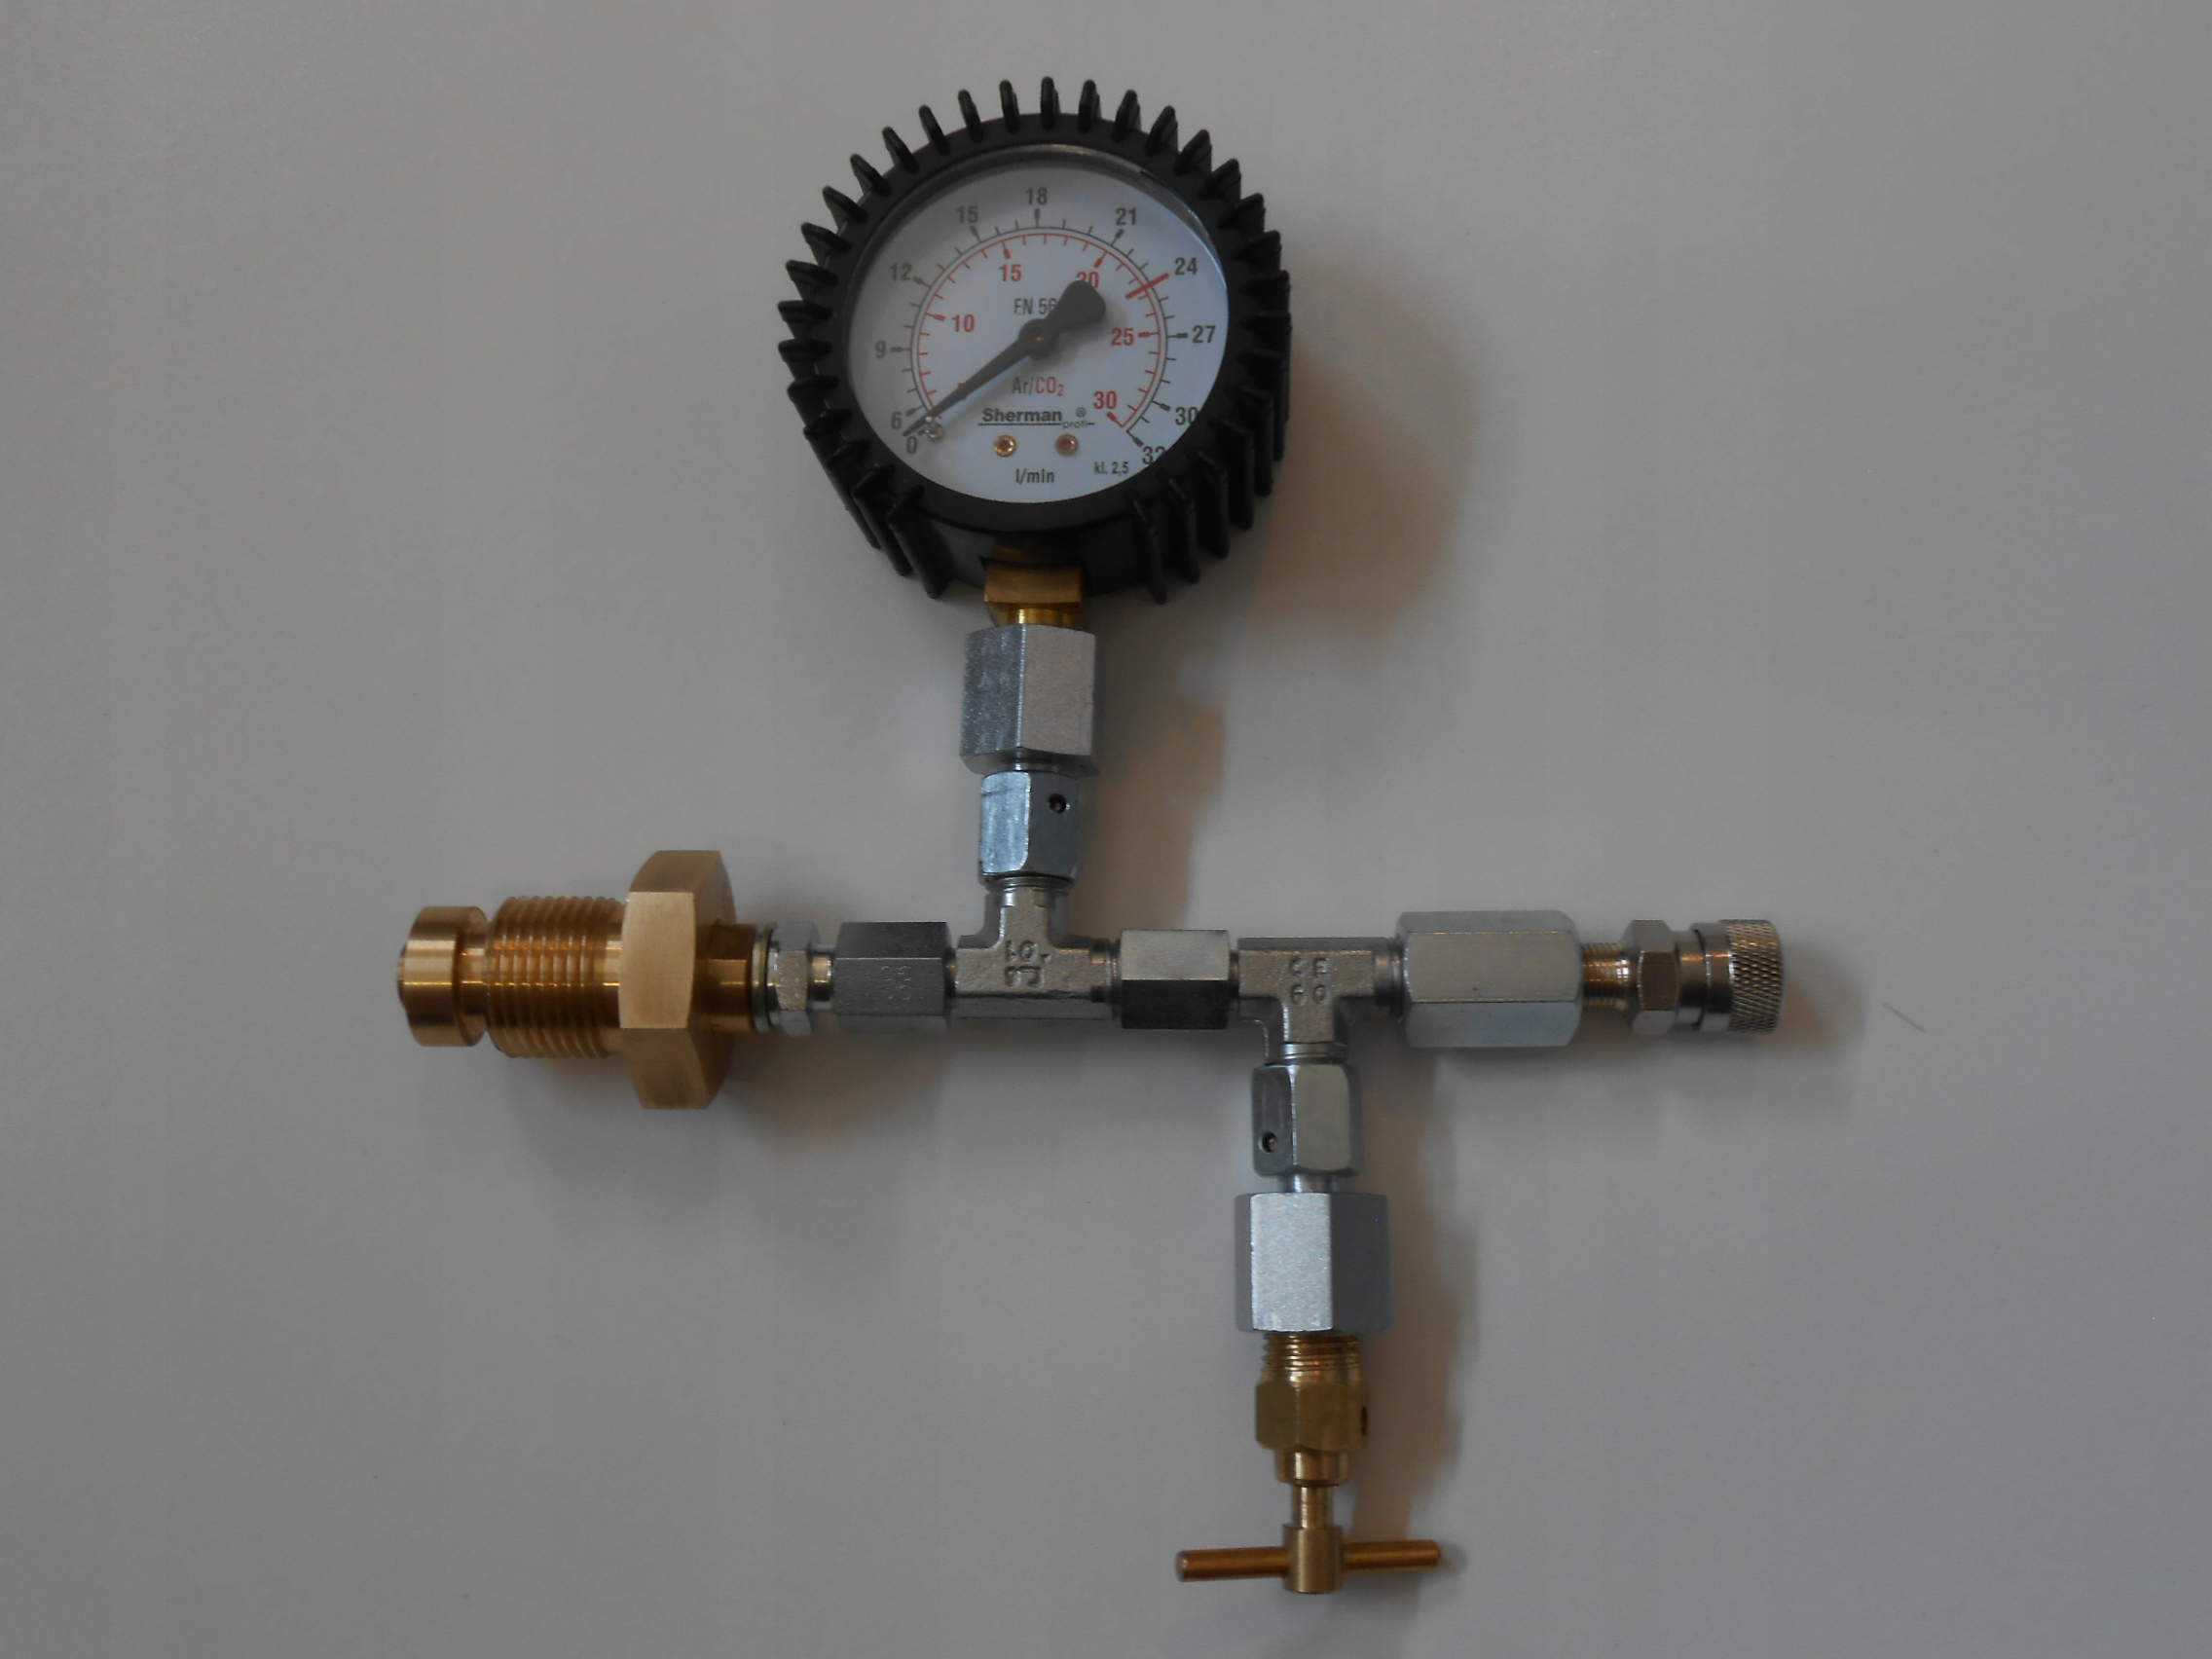 Nabíjacej stanice PCP/HP s tlakomerom a przetoczka